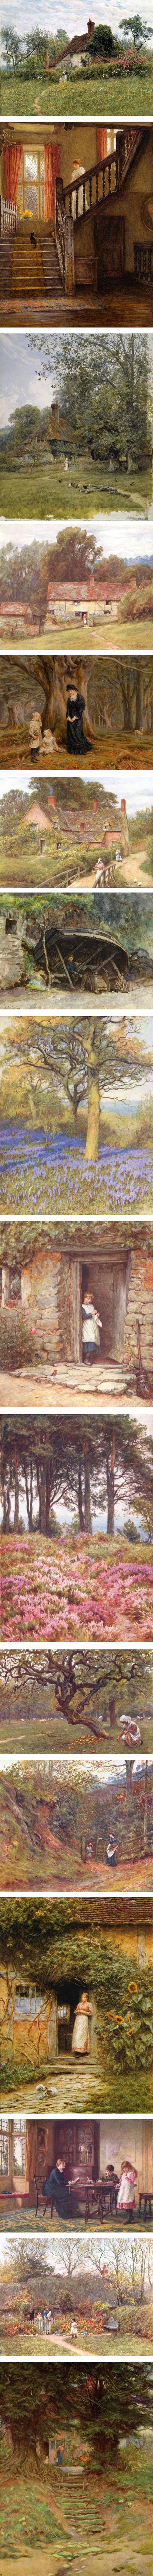 Helen Allingham, 19th century watercolor